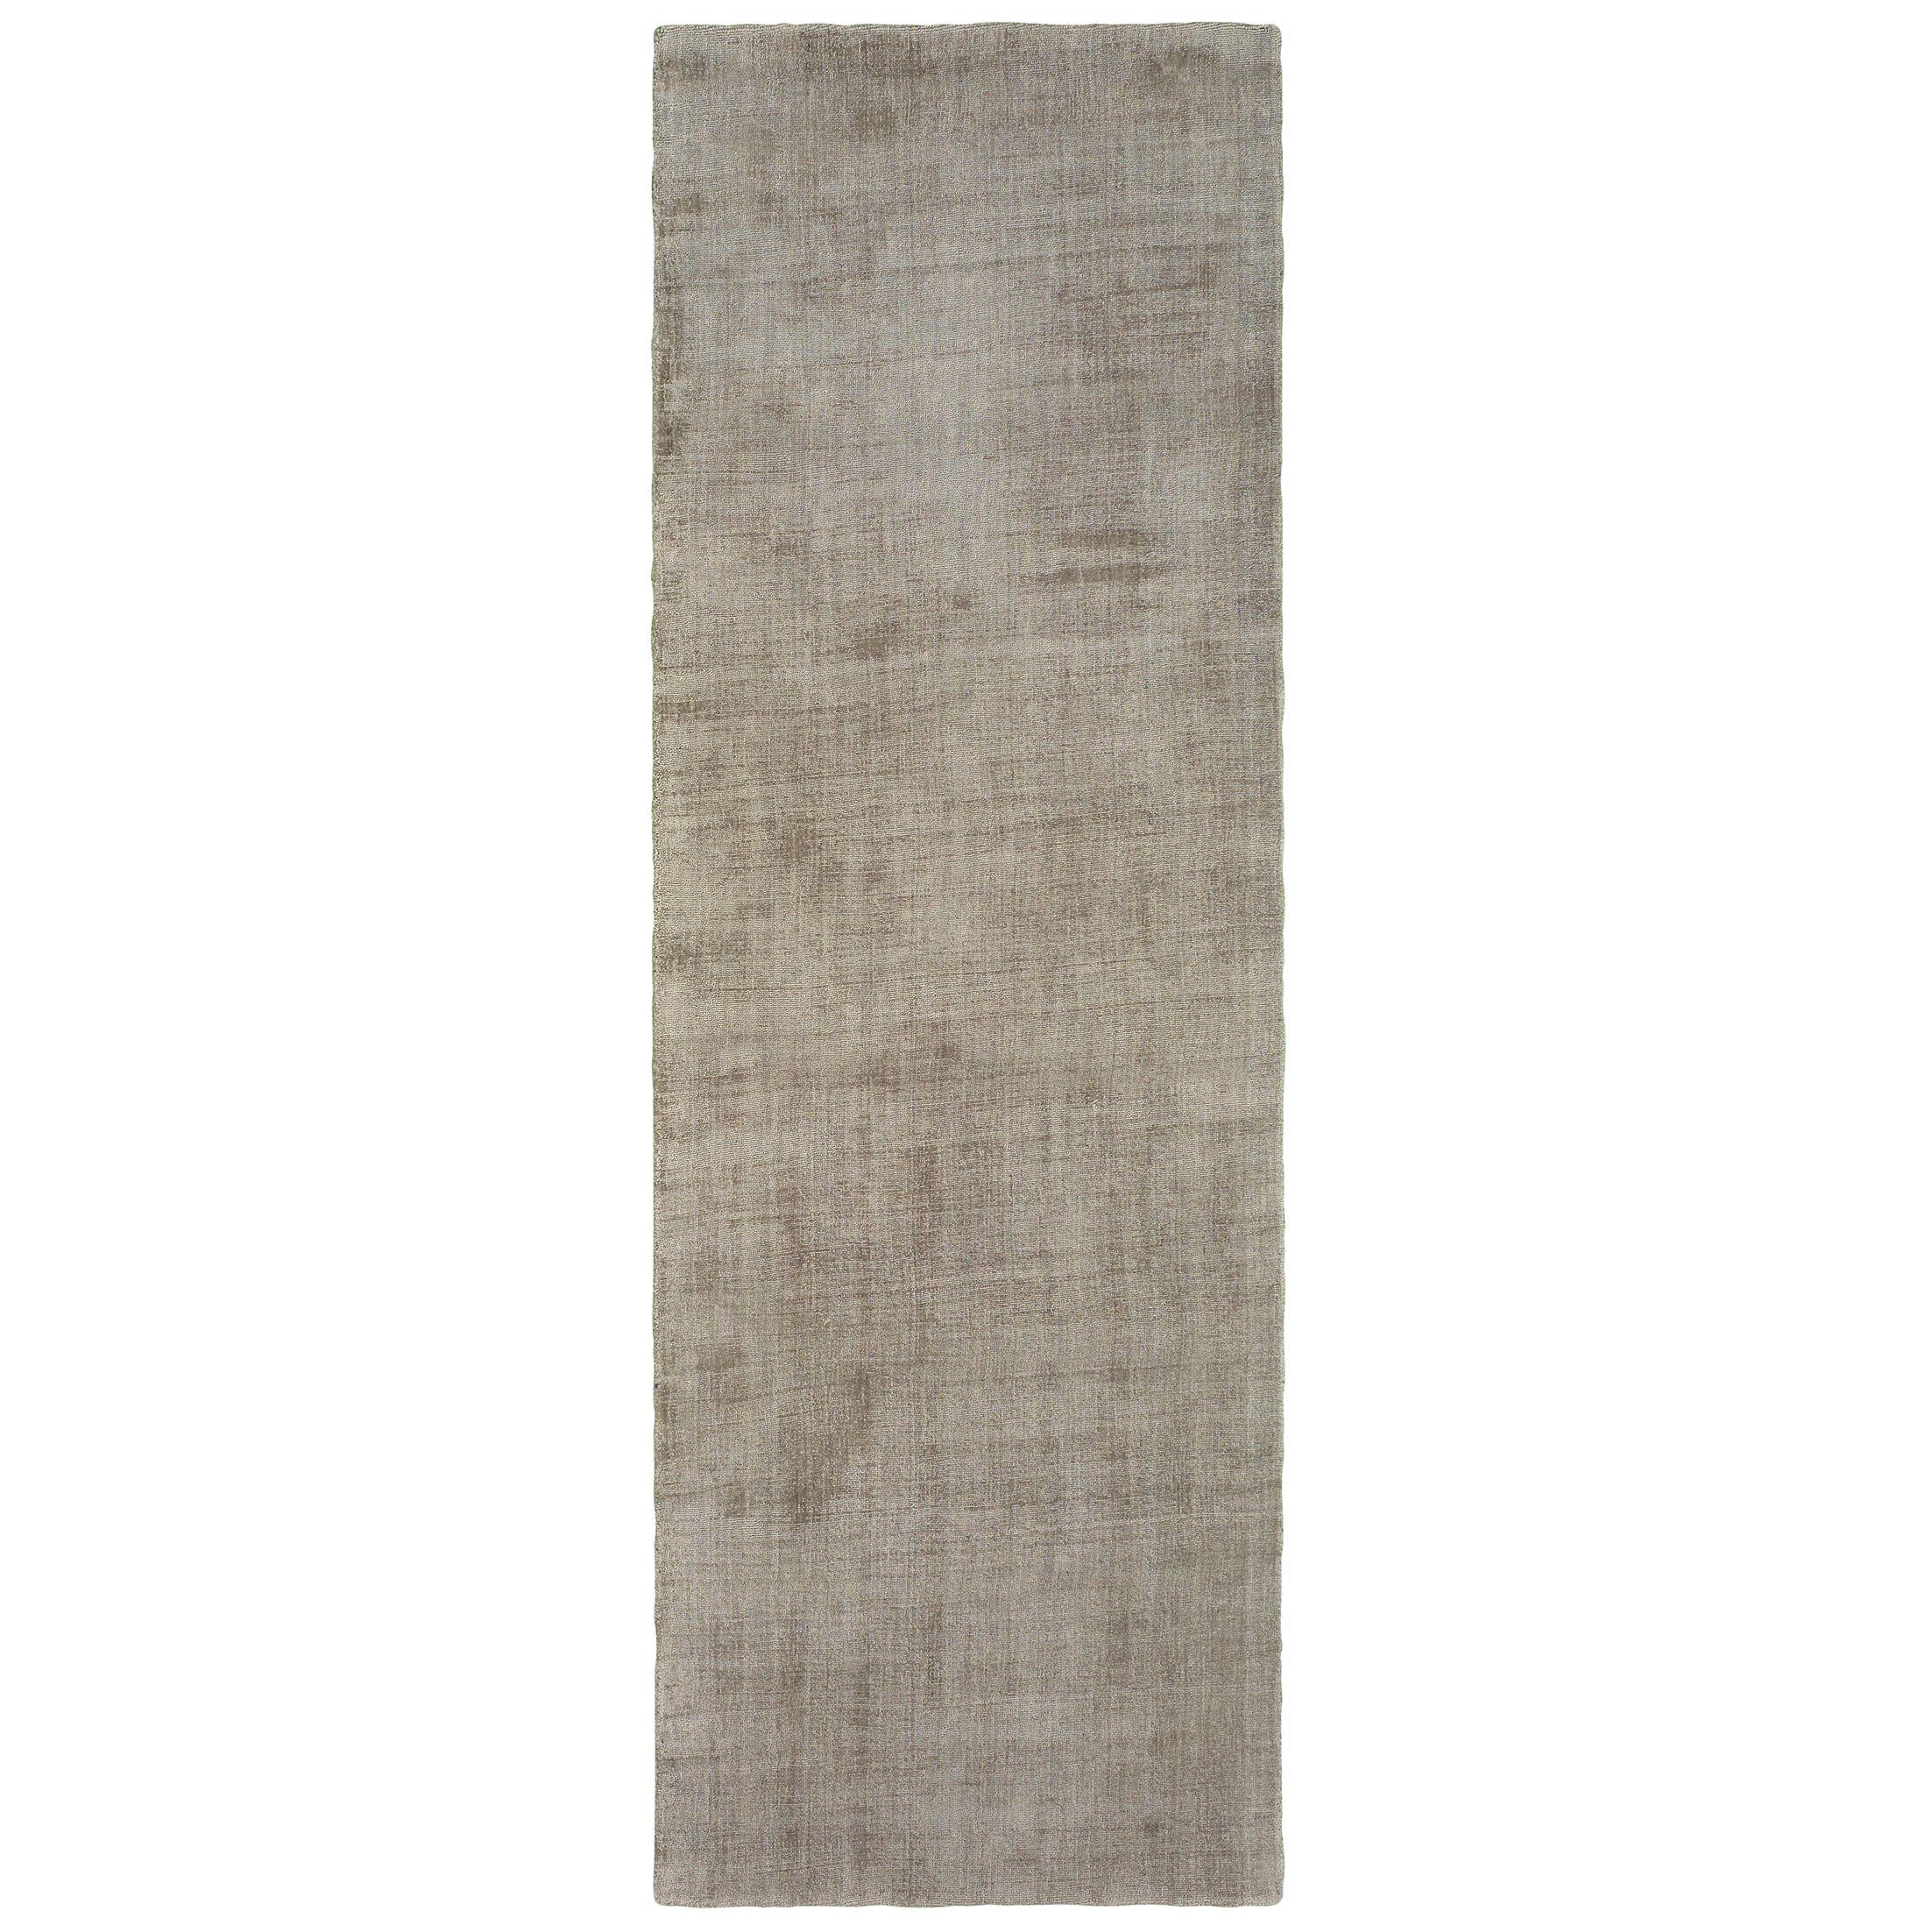 Grimes Plush Hand-Tufted Beige Area Rug Rug Size: Runner 2'6